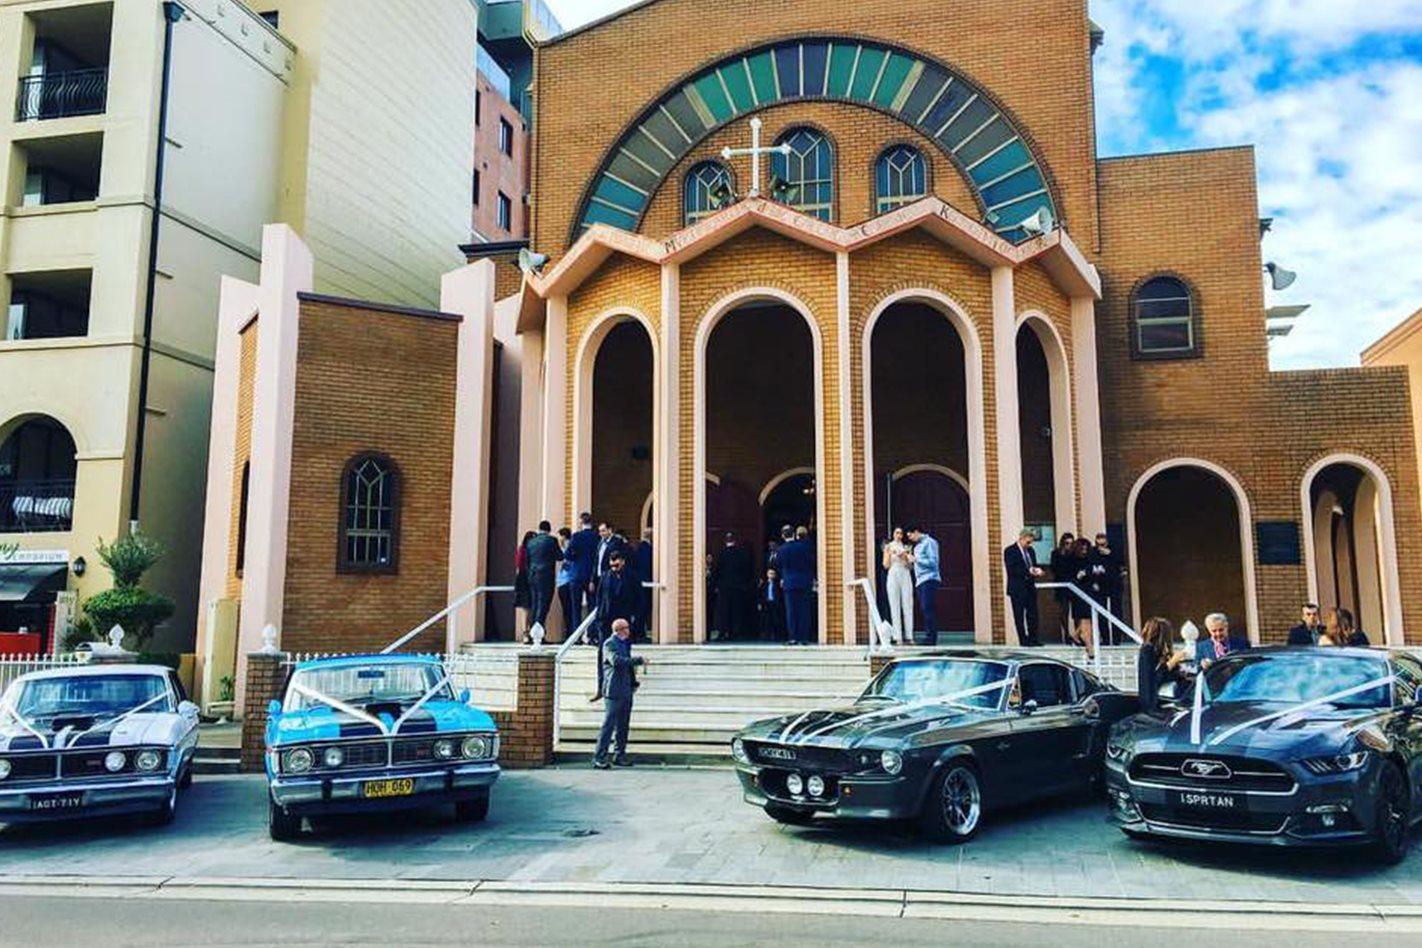 Peter Vahaviolos's wedding cars